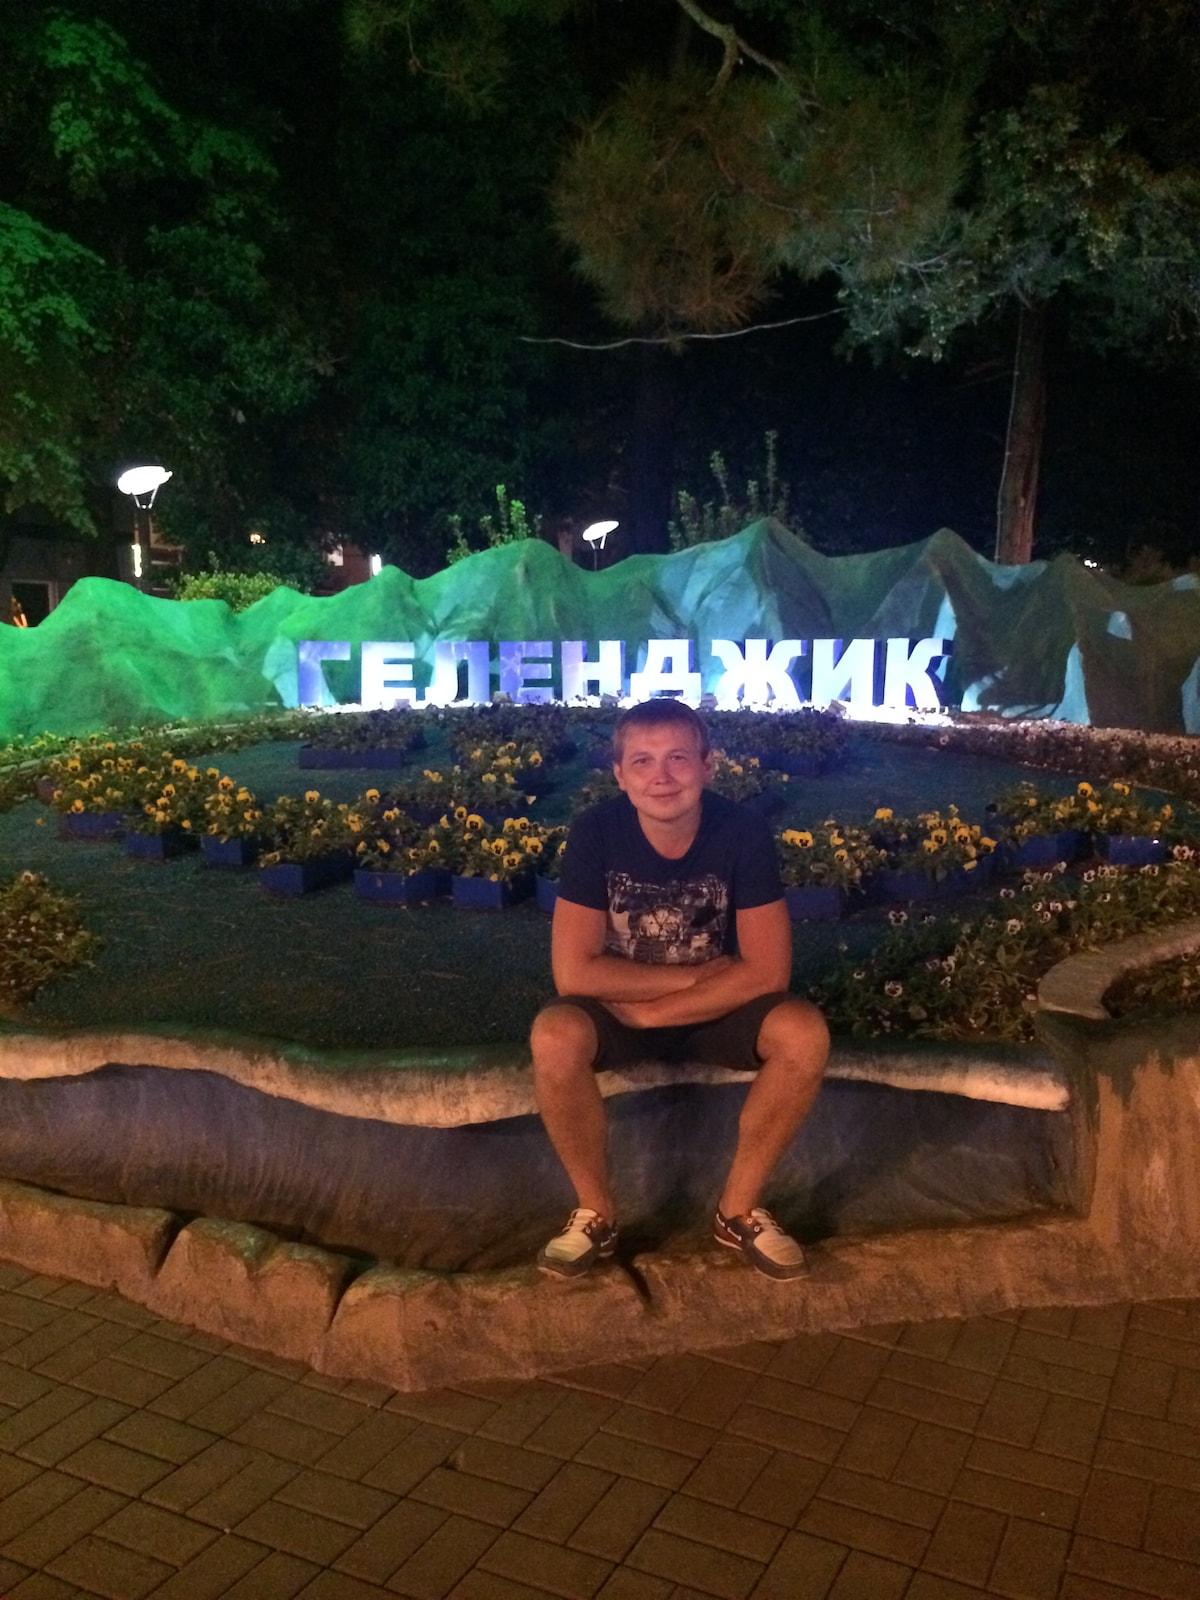 Дмитрий from Kazan